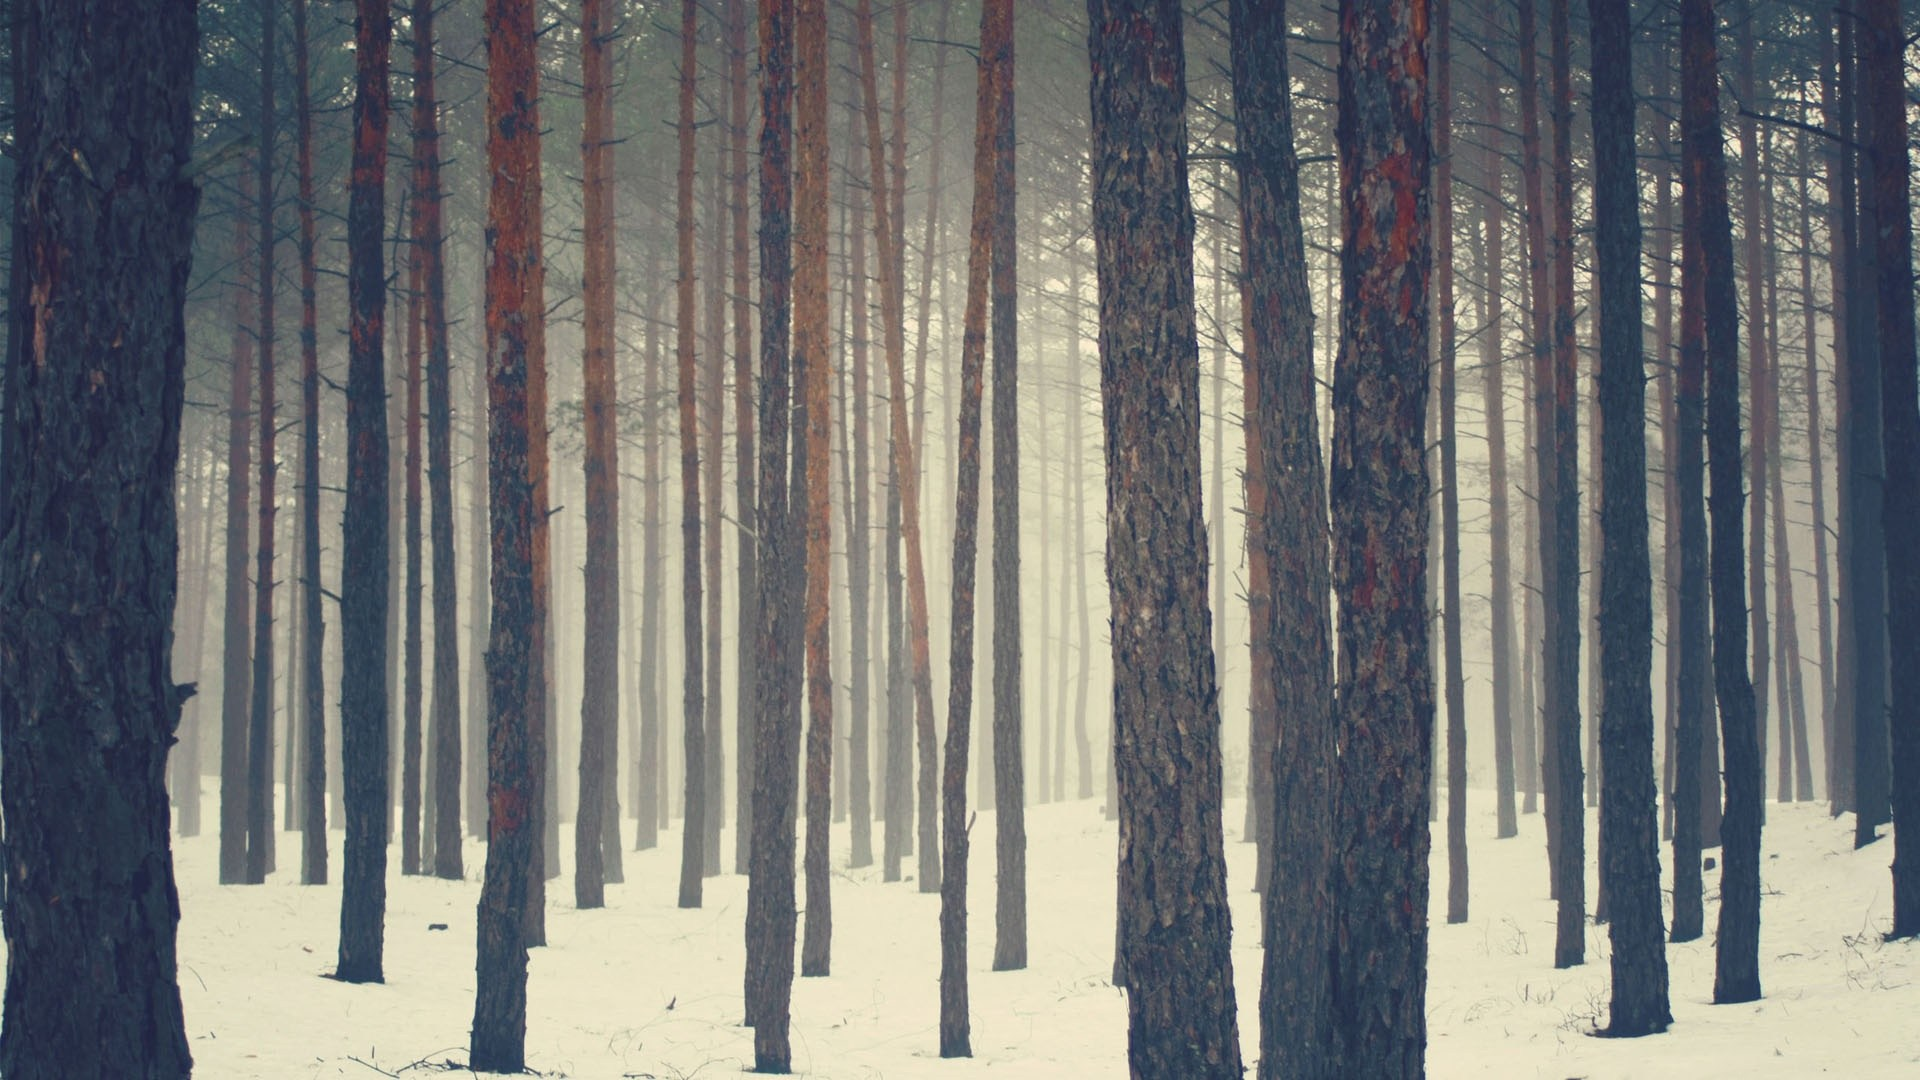 Sweden Wallpaper Forest Hd Desktop Wallpapers 4k Hd Deeper Jungle Rinse Fm 799785 Hd Wallpaper Backgrounds Download